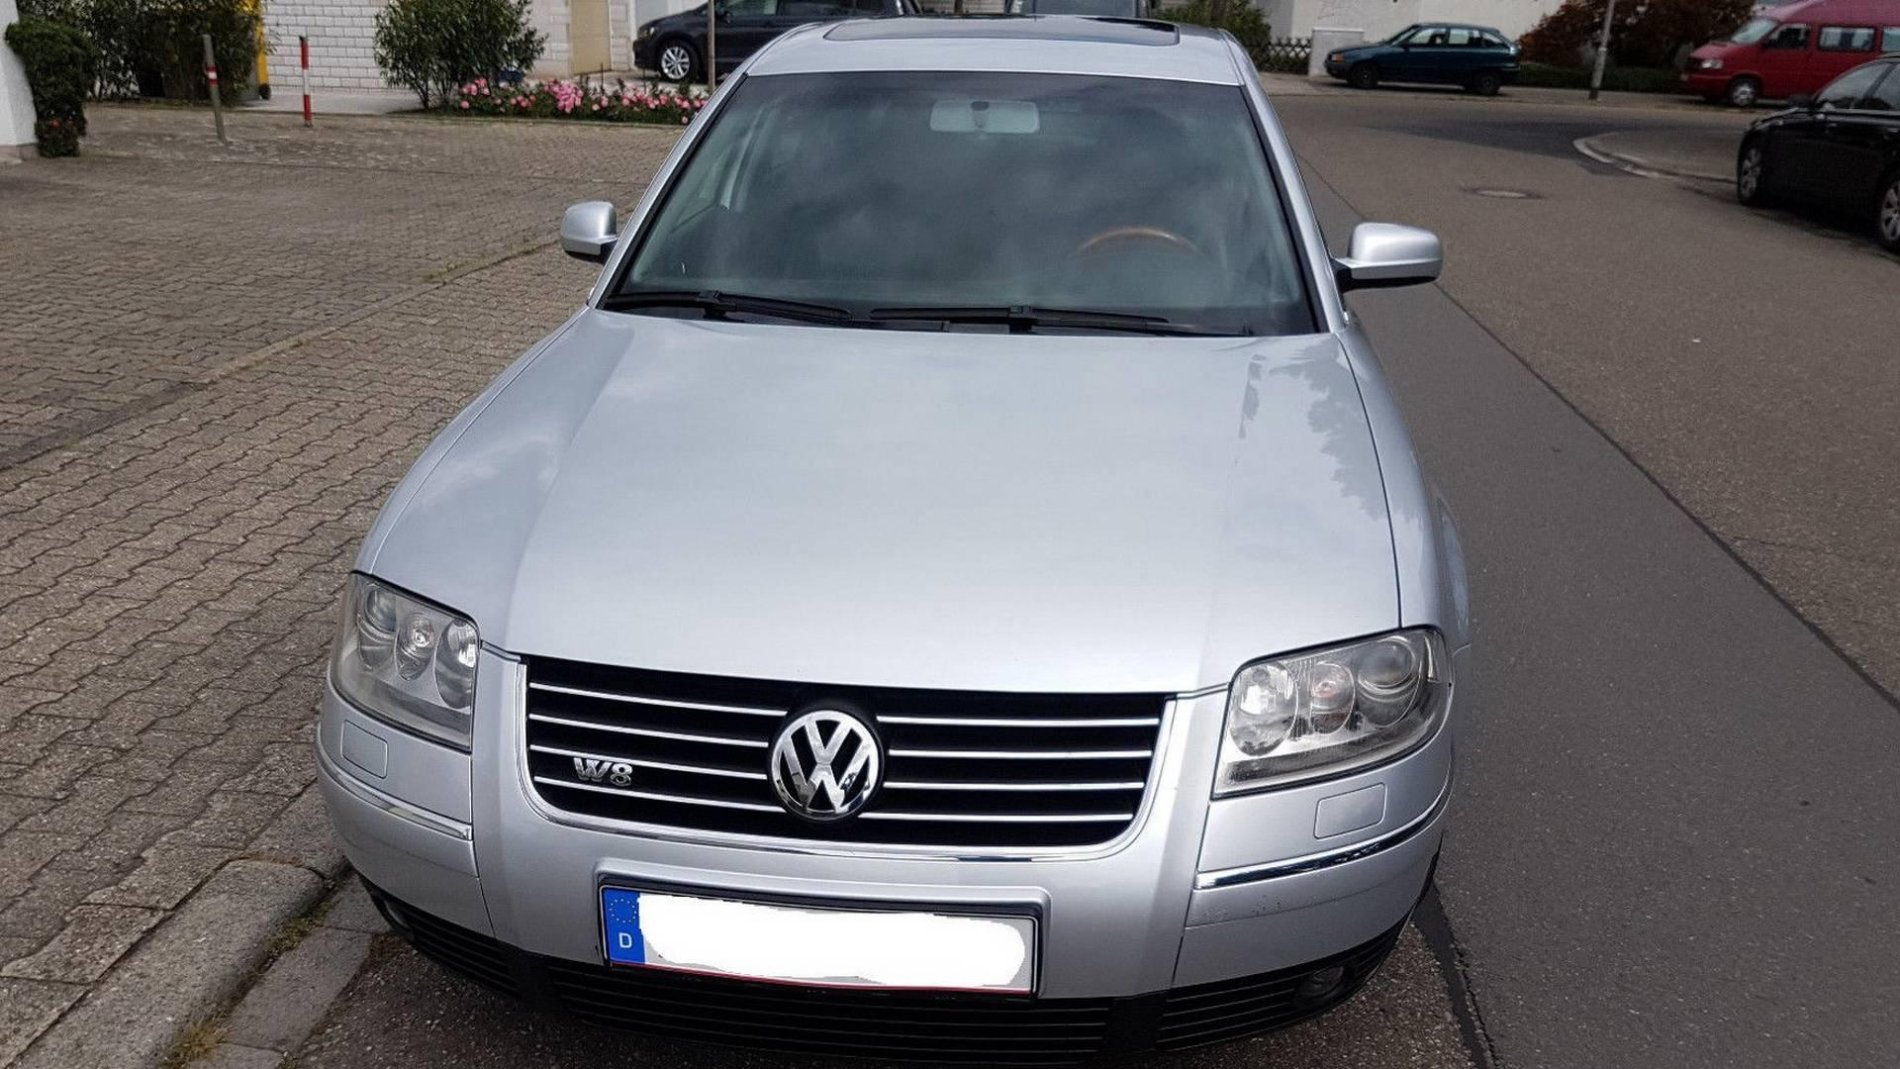 Volkswagen Passat W8 din 2002 - Volkswagen Passat W8 din 2002